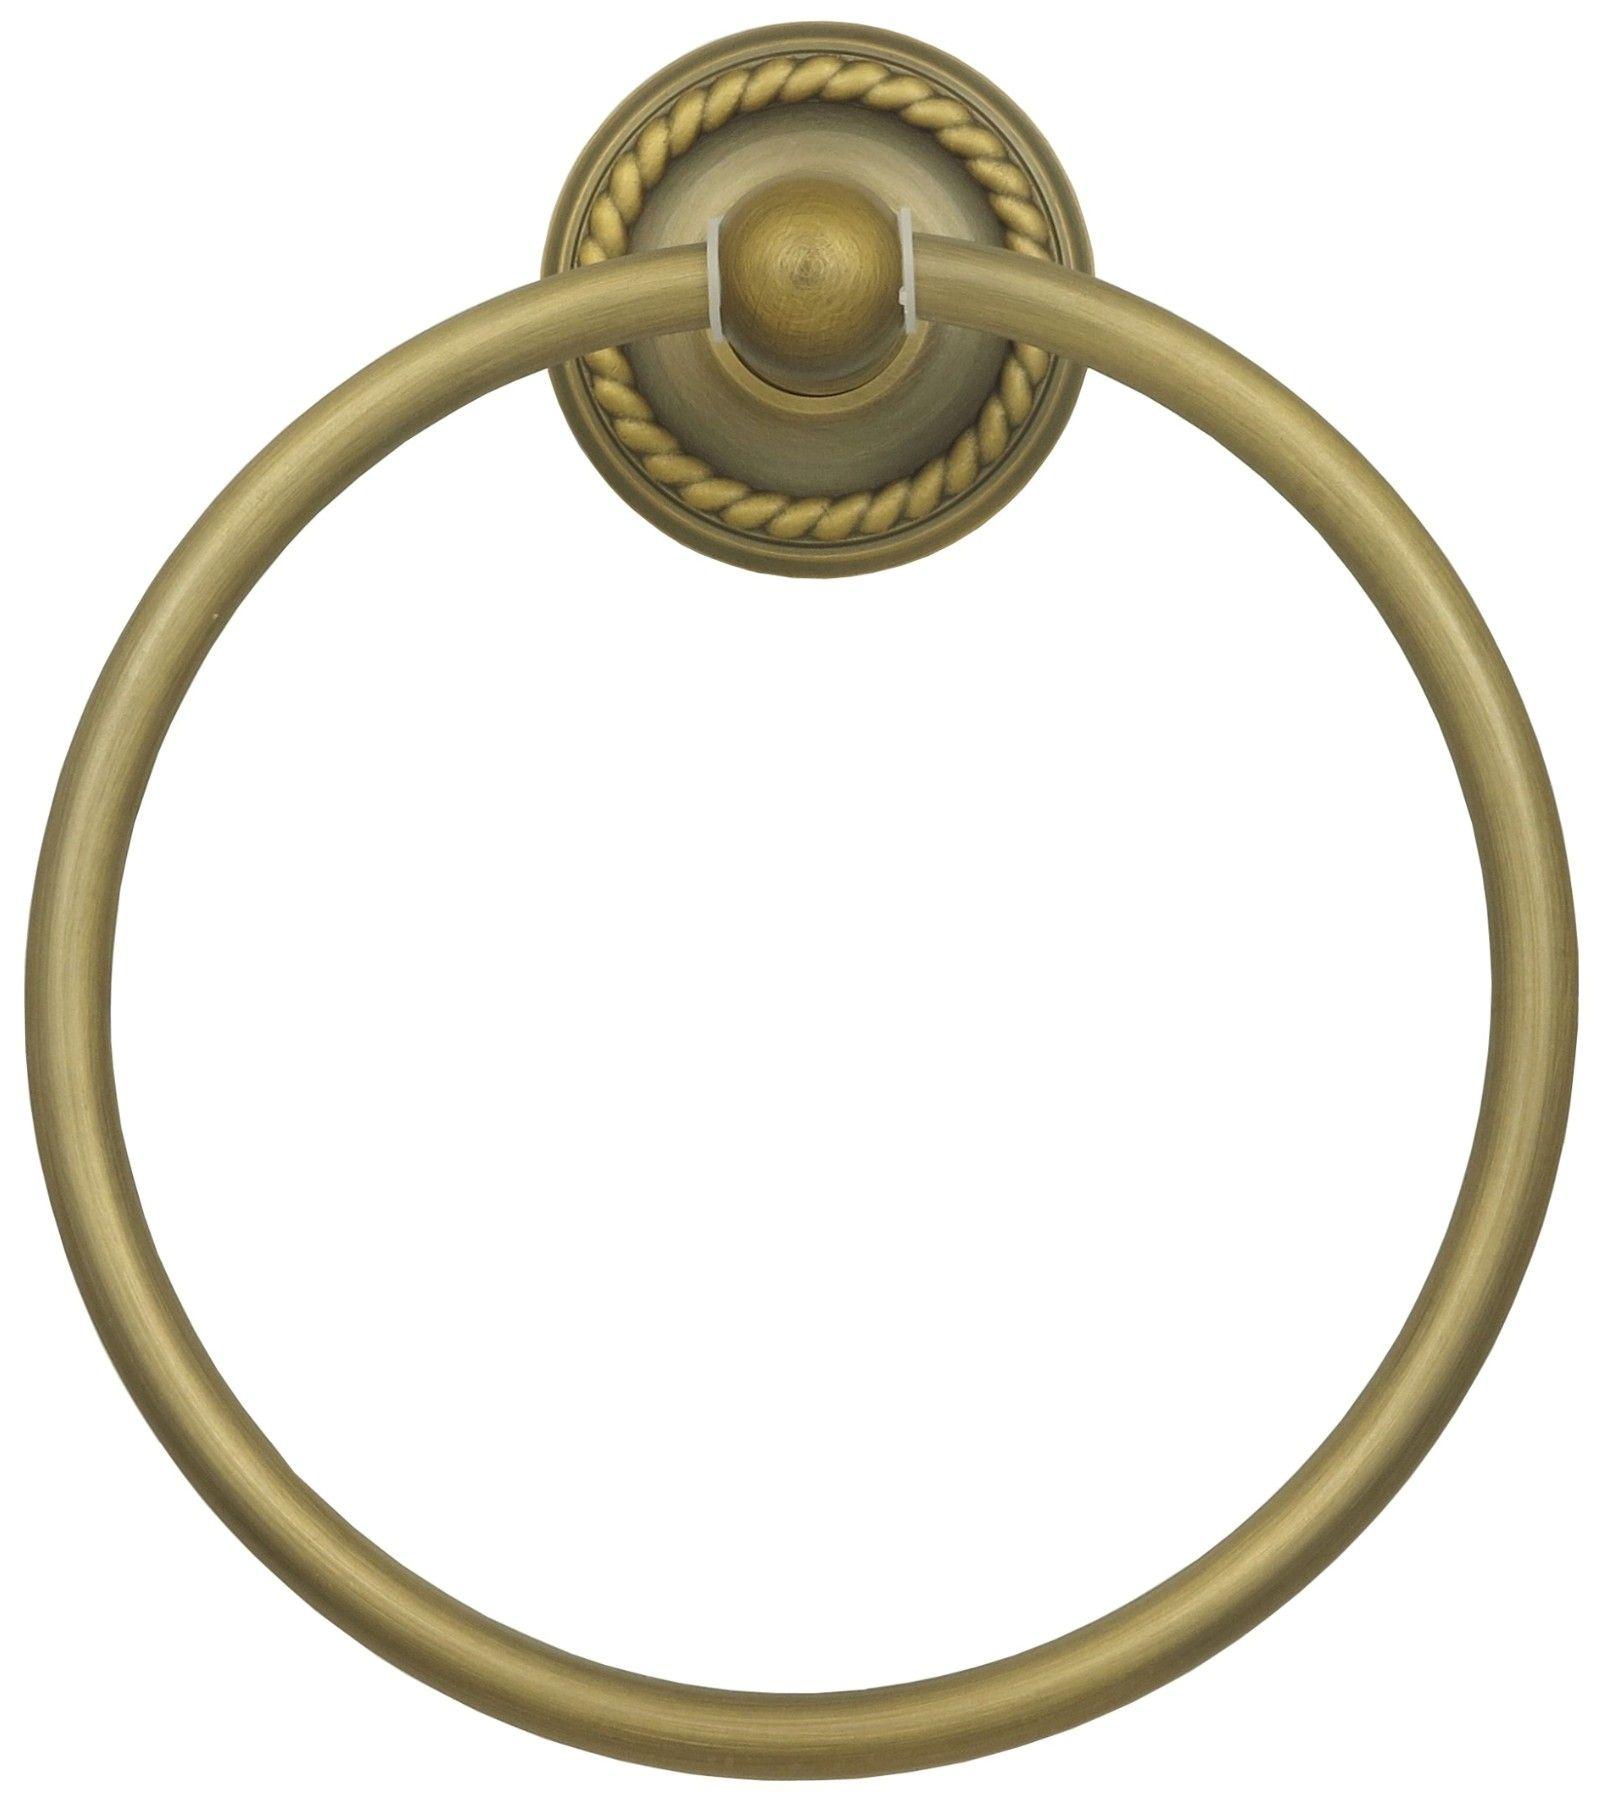 Vintage Handtuchring Retro Handtuchhalter Ring in Antik